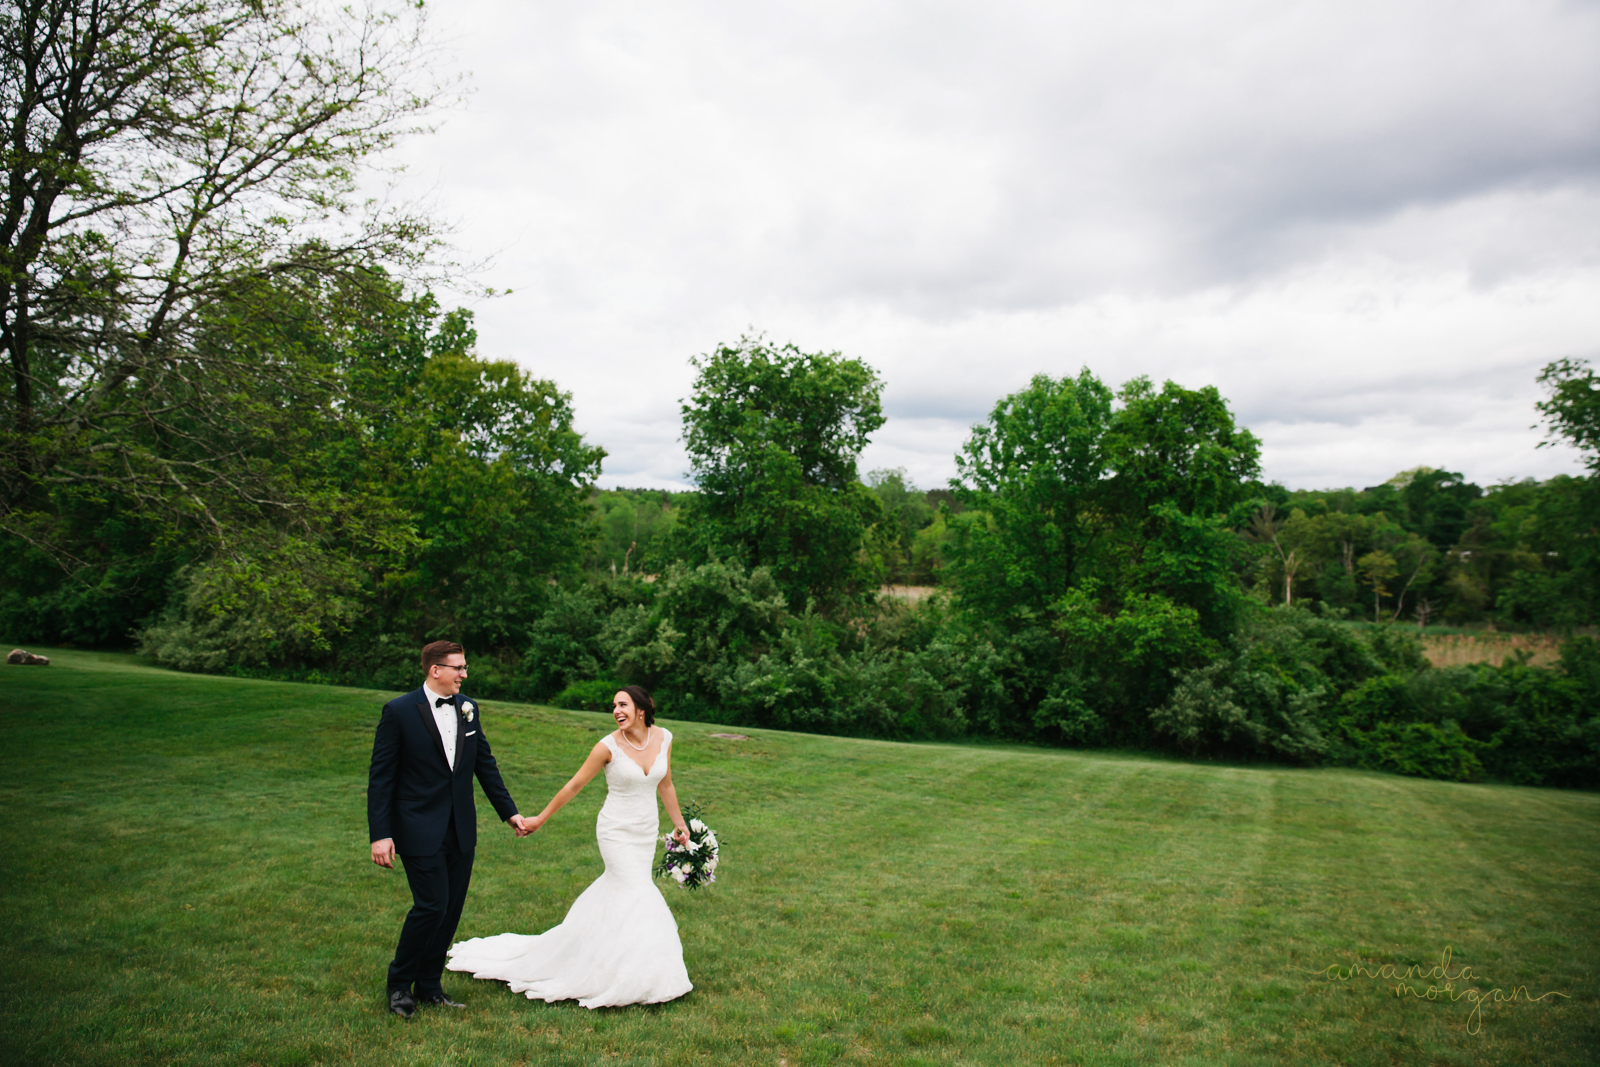 Publick-House-Wedding-Amanda-Morgan-29.jpg